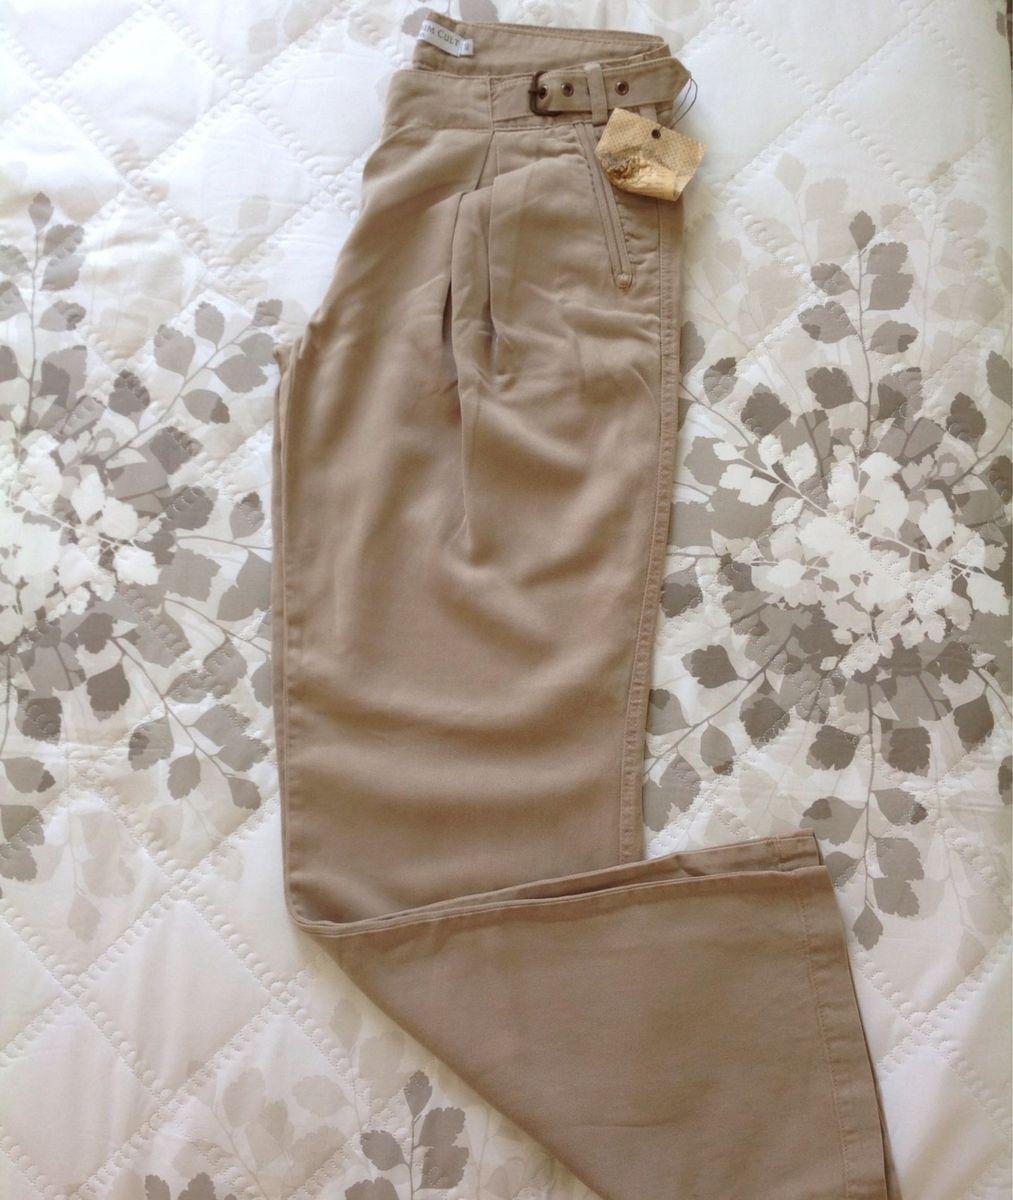 86fa7eef0 calça pantalona siberian - calças siberian.  Czm6ly9wag90b3muzw5qb2vplmnvbs5ici9wcm9kdwn0cy81mzgyntk5lznkztqzowe1nzy1ytlinjrlyza5mzixm2fjy2m3njaylmpwzw